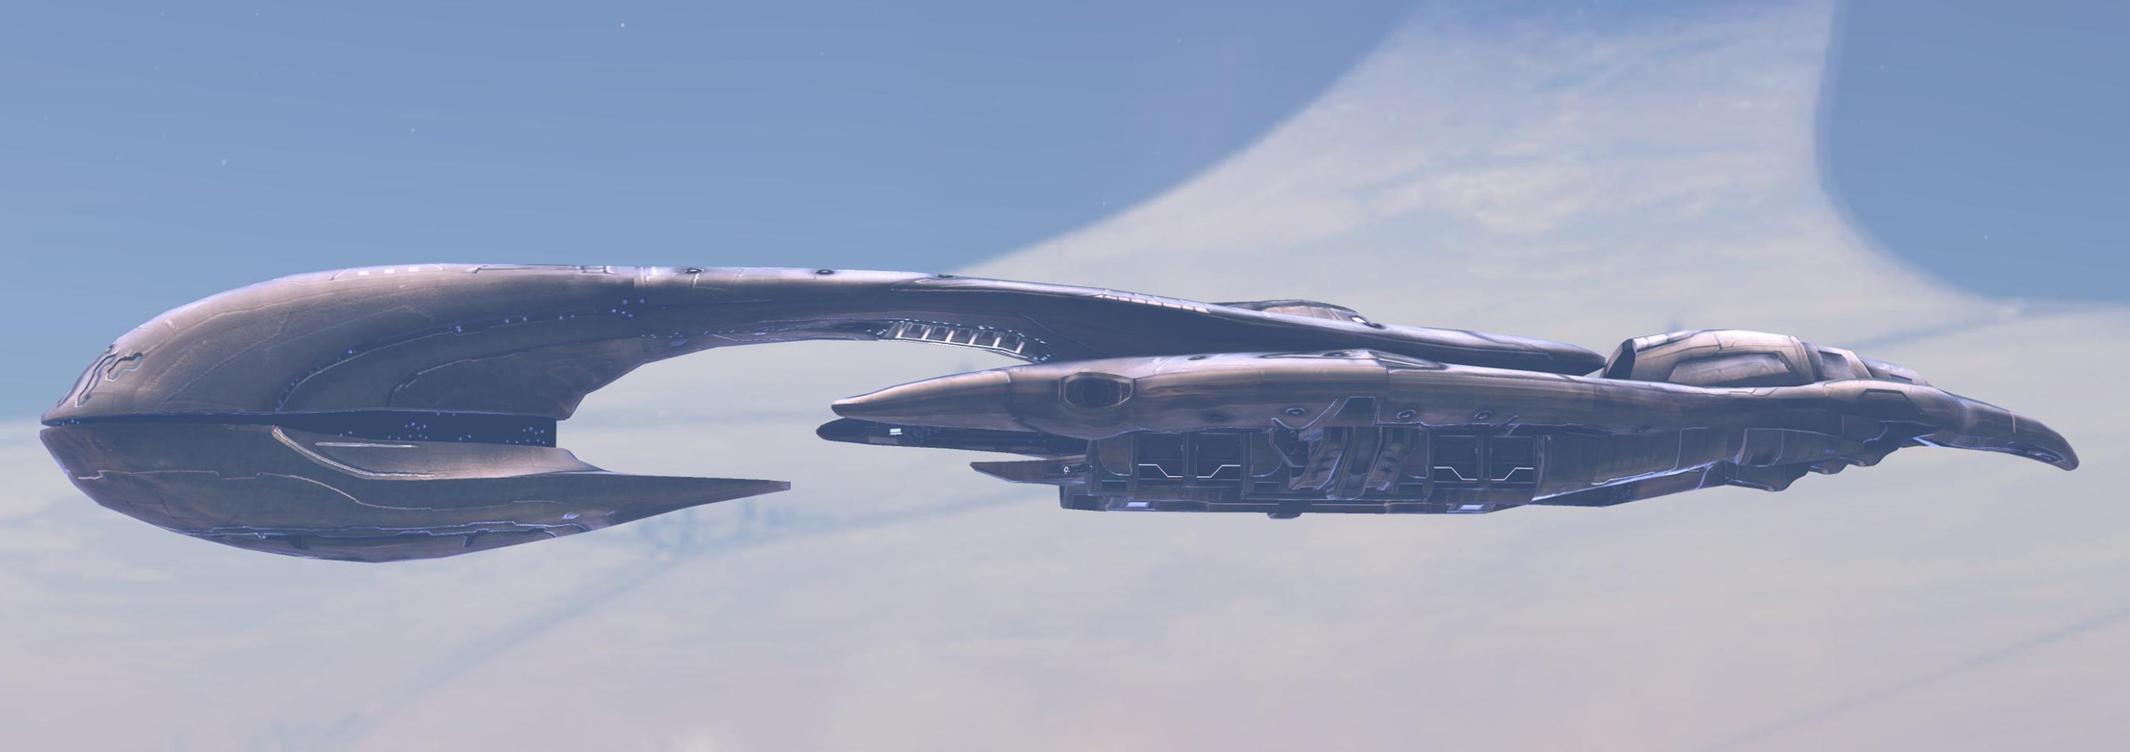 SHADOW OF INTENT - TYPE: CAS-class assault carrierCOMMISSION DATE: c. 2135